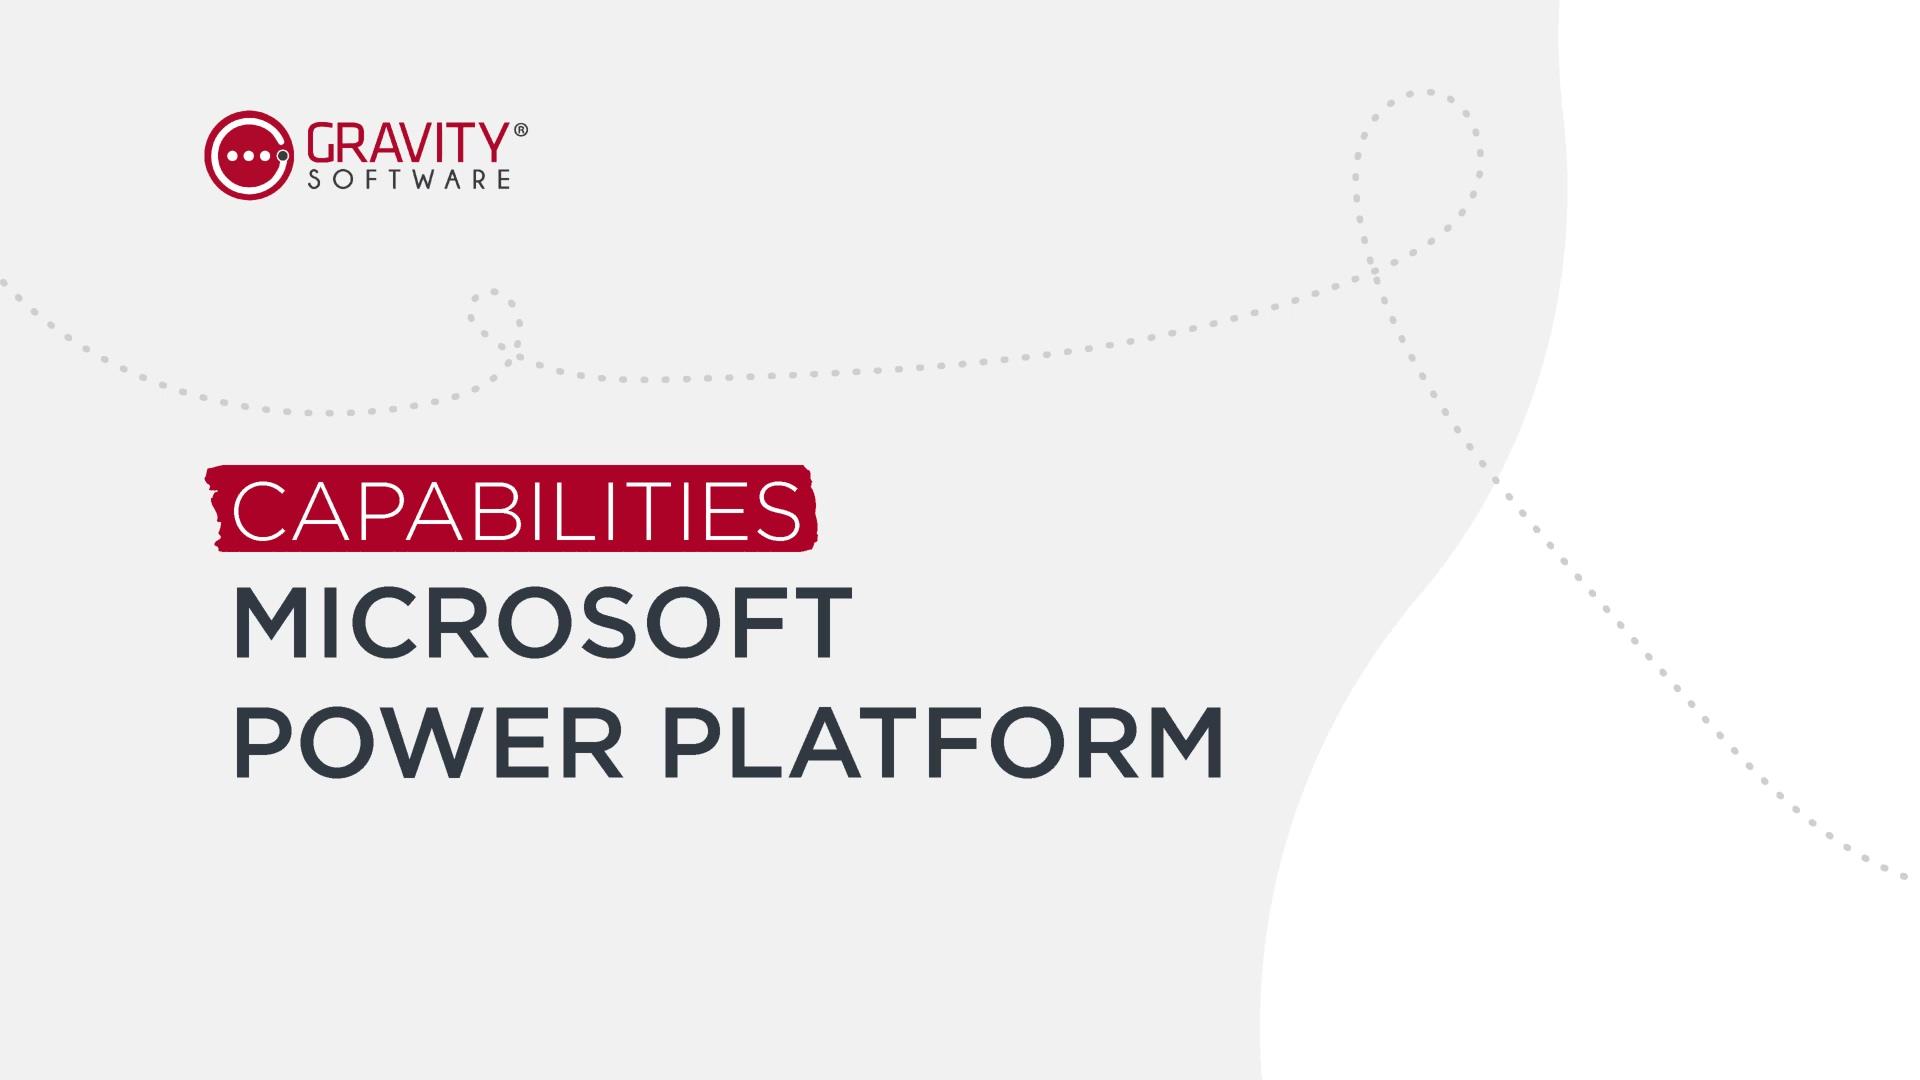 Gravity Software Built on the Microsoft Power Platform